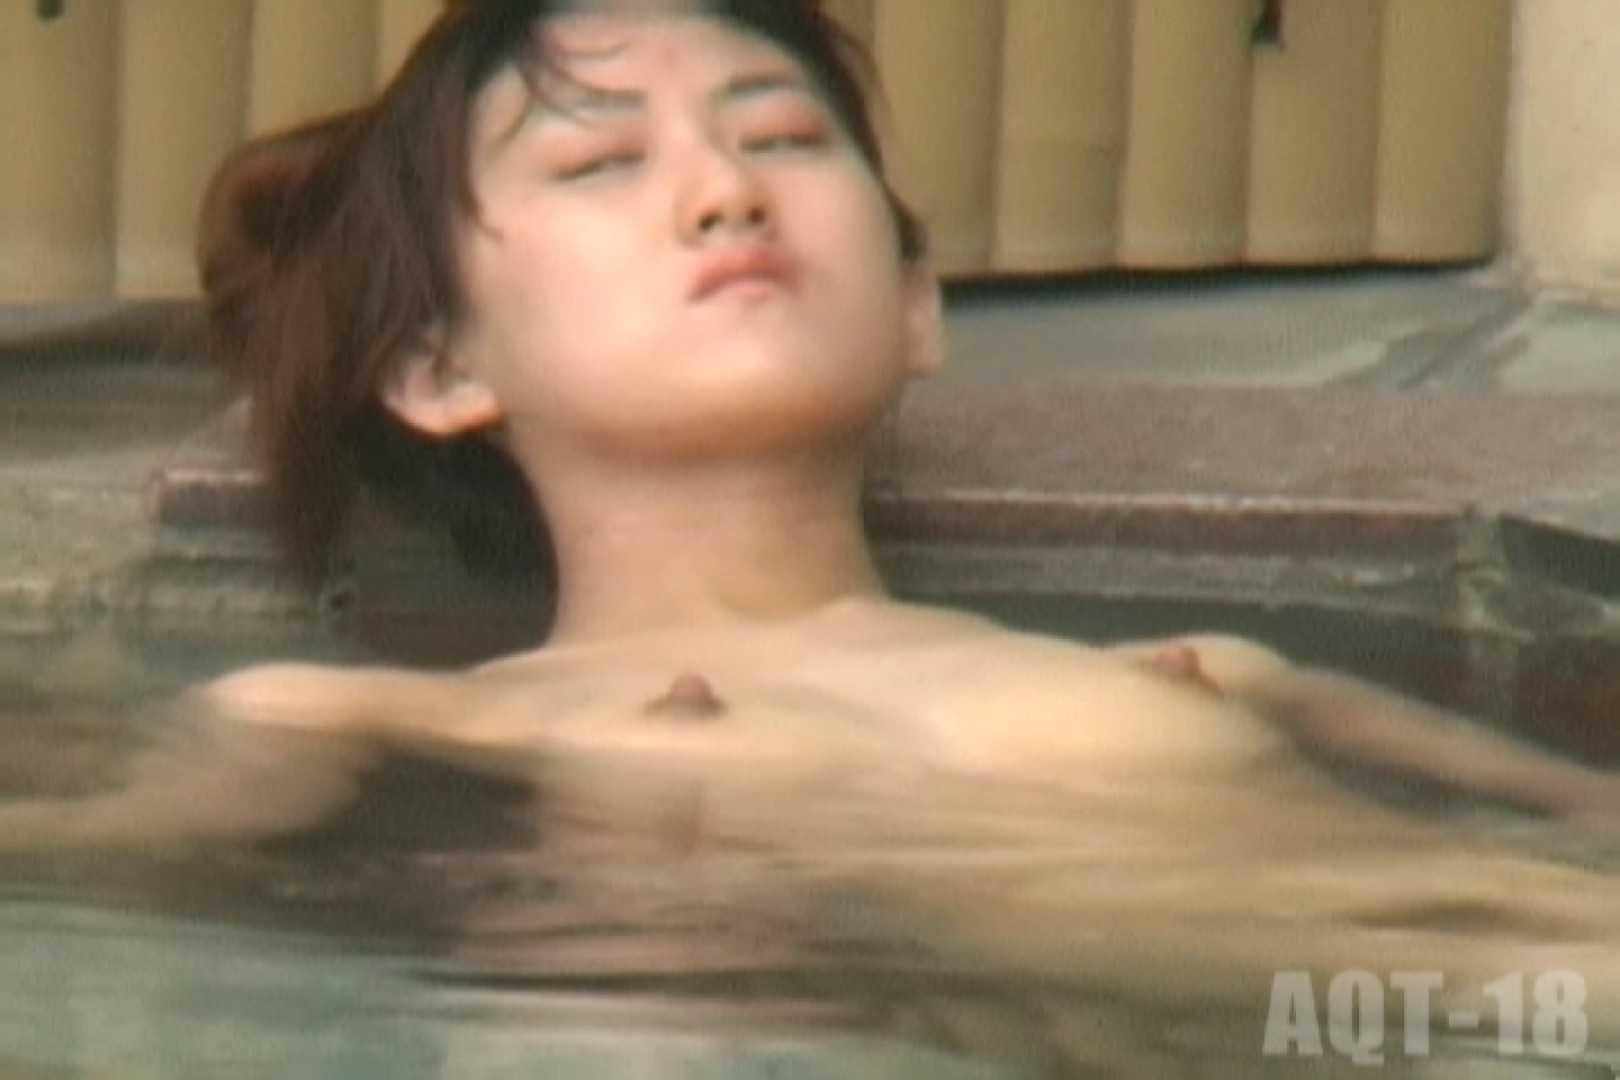 Aquaな露天風呂Vol.862 盗撮 AV無料動画キャプチャ 92PICs 44